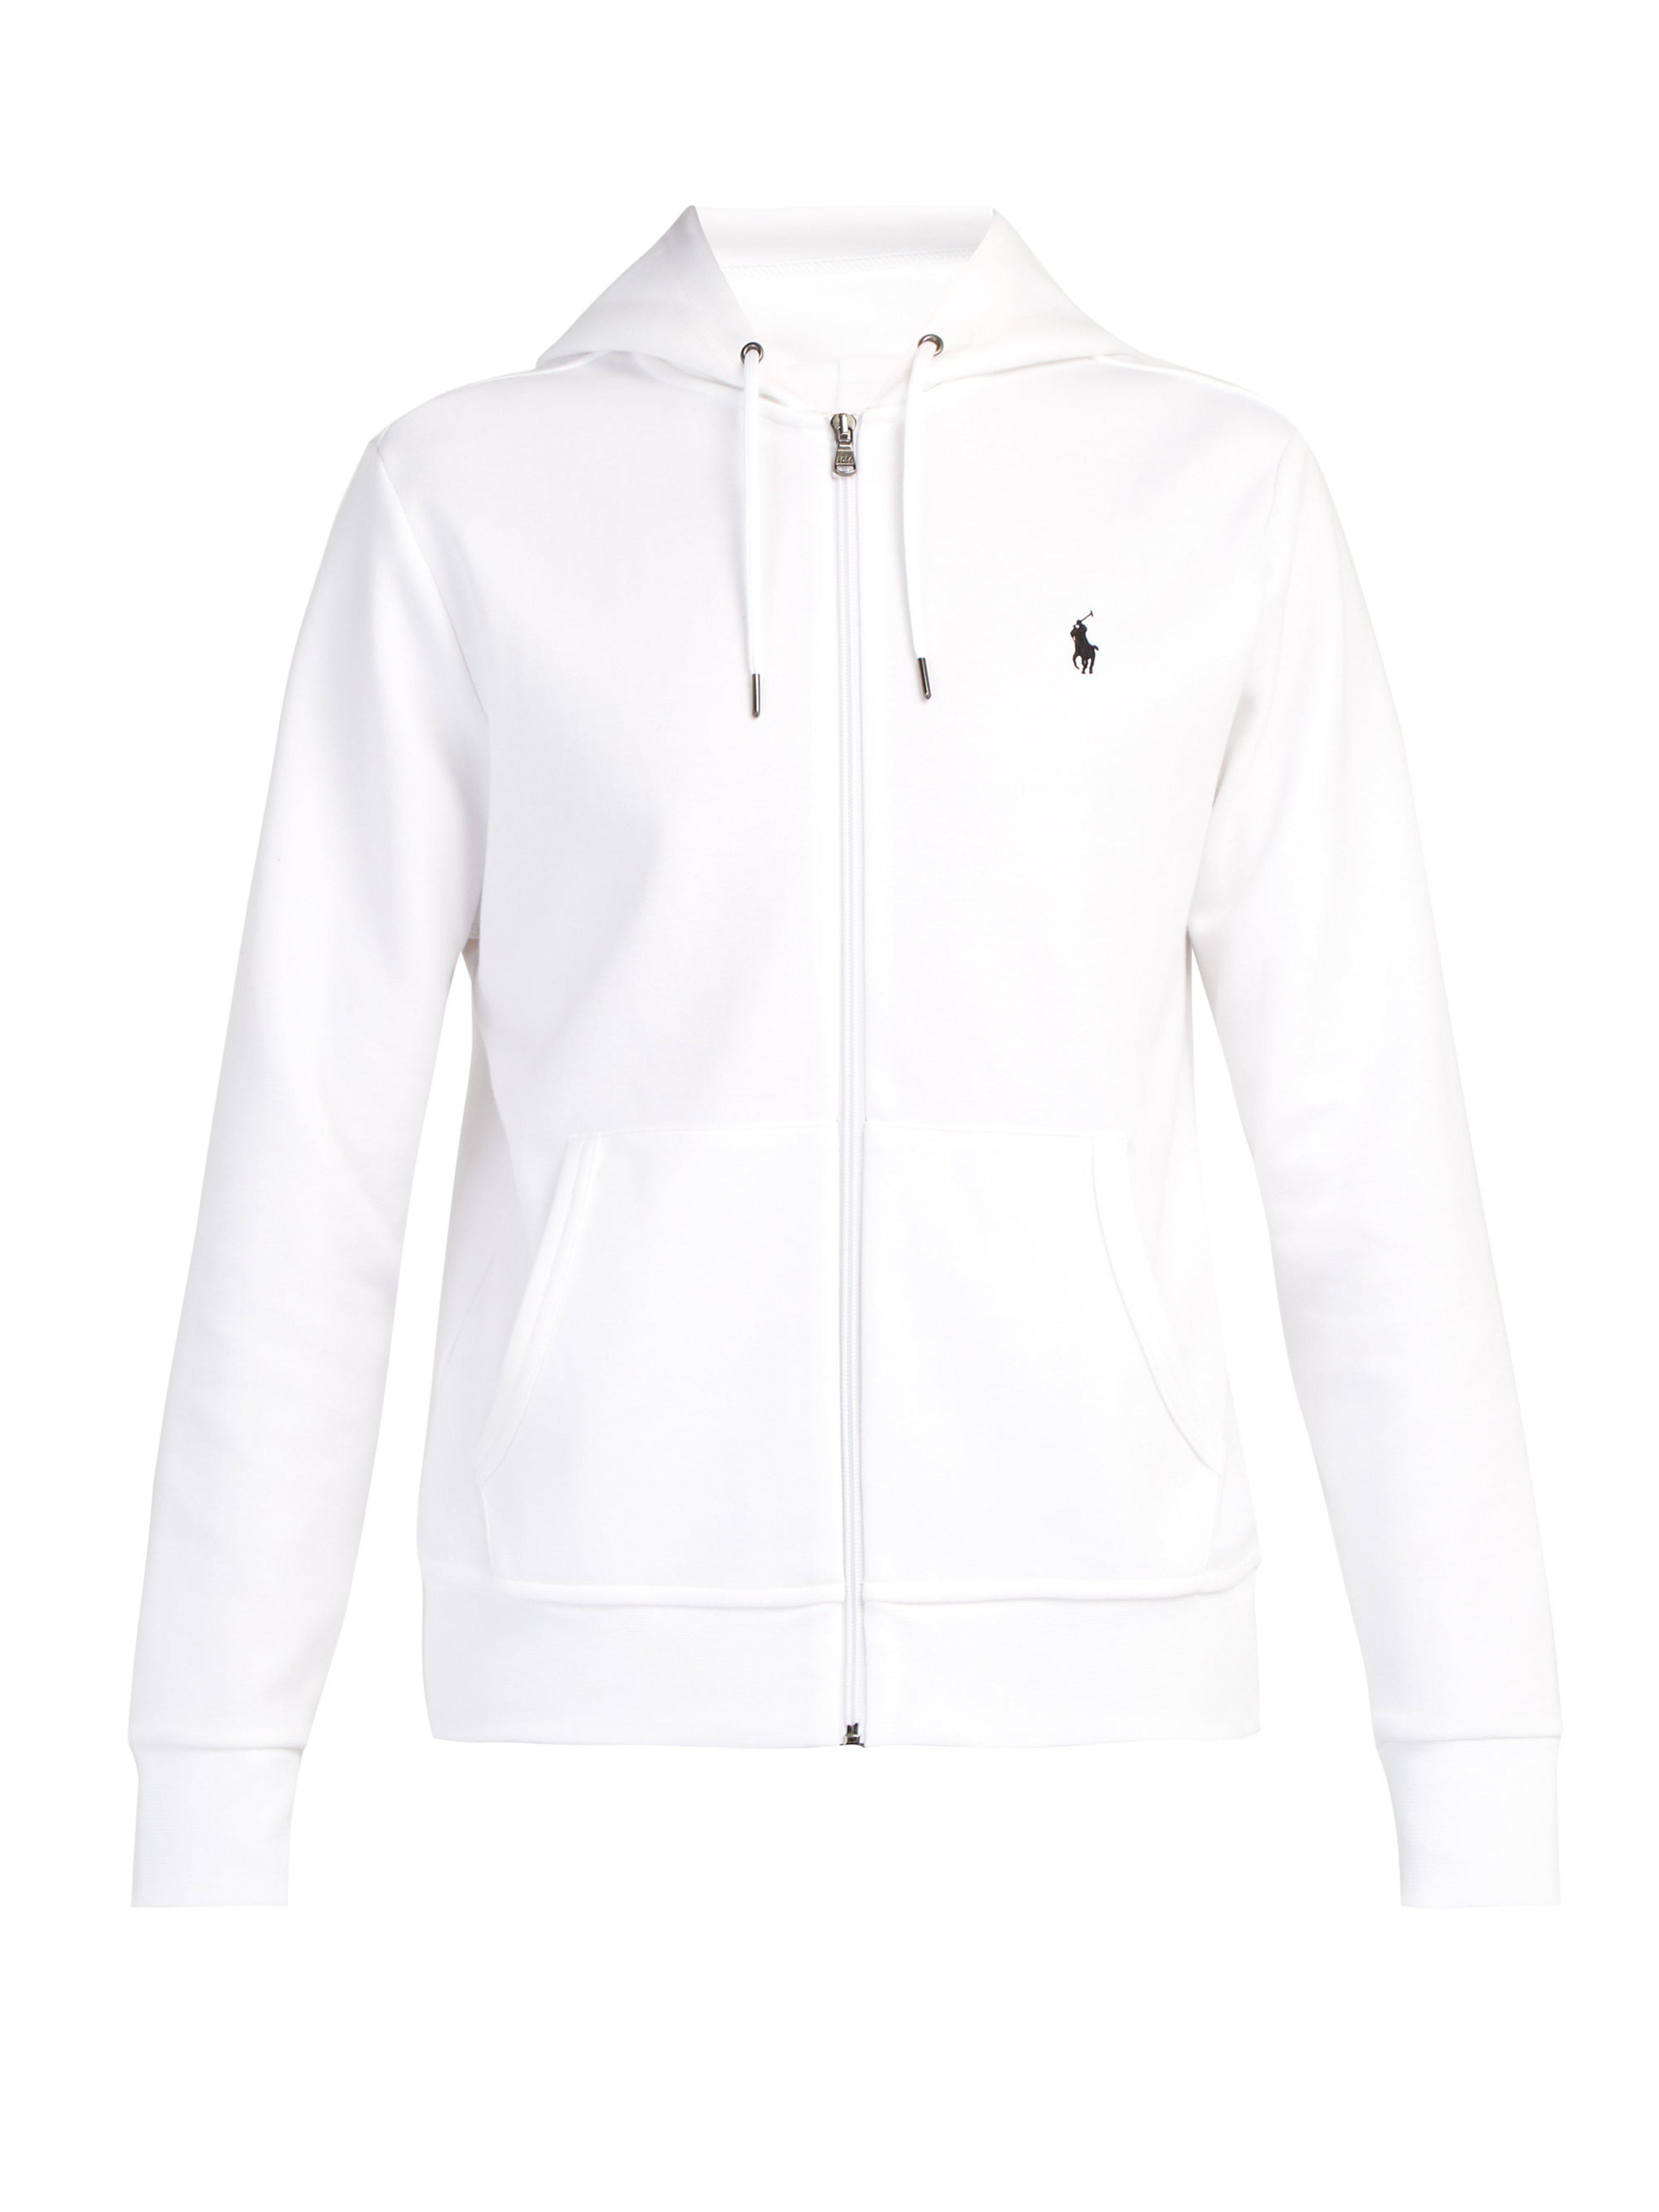 23e71cf7b308c Polo Ralph Lauren. Men s White Logo Embroidered Zip Through Hooded  Sweatshirt